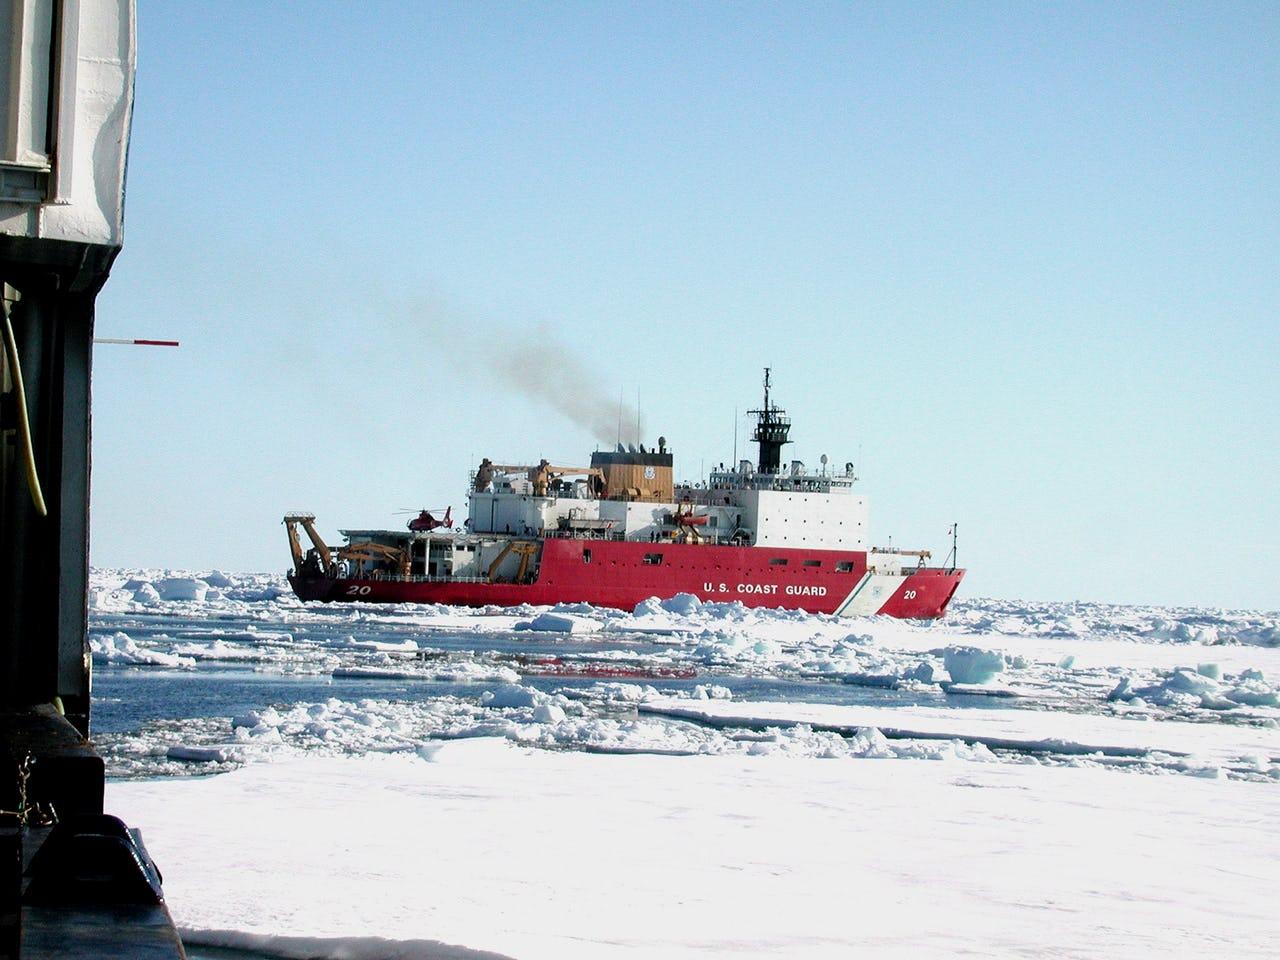 Vessel navigating through ice